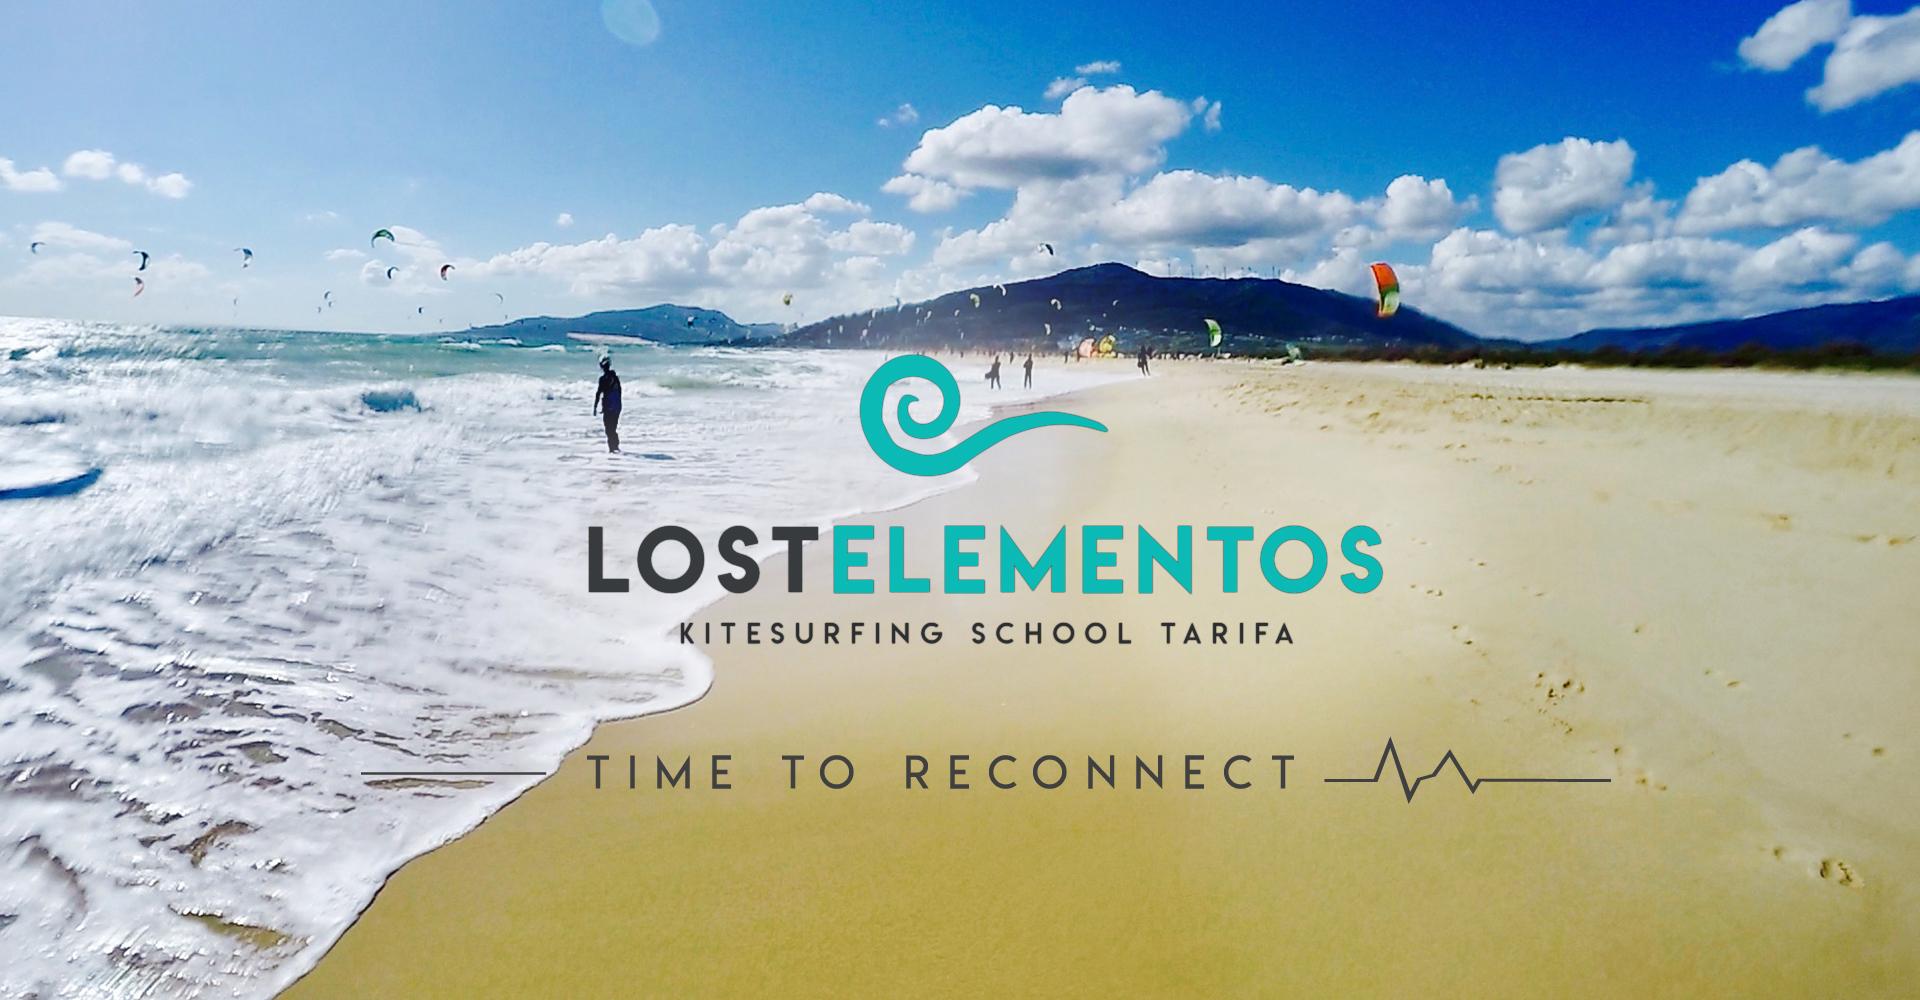 Lost Elementos - Kitesurfing School Tarifa